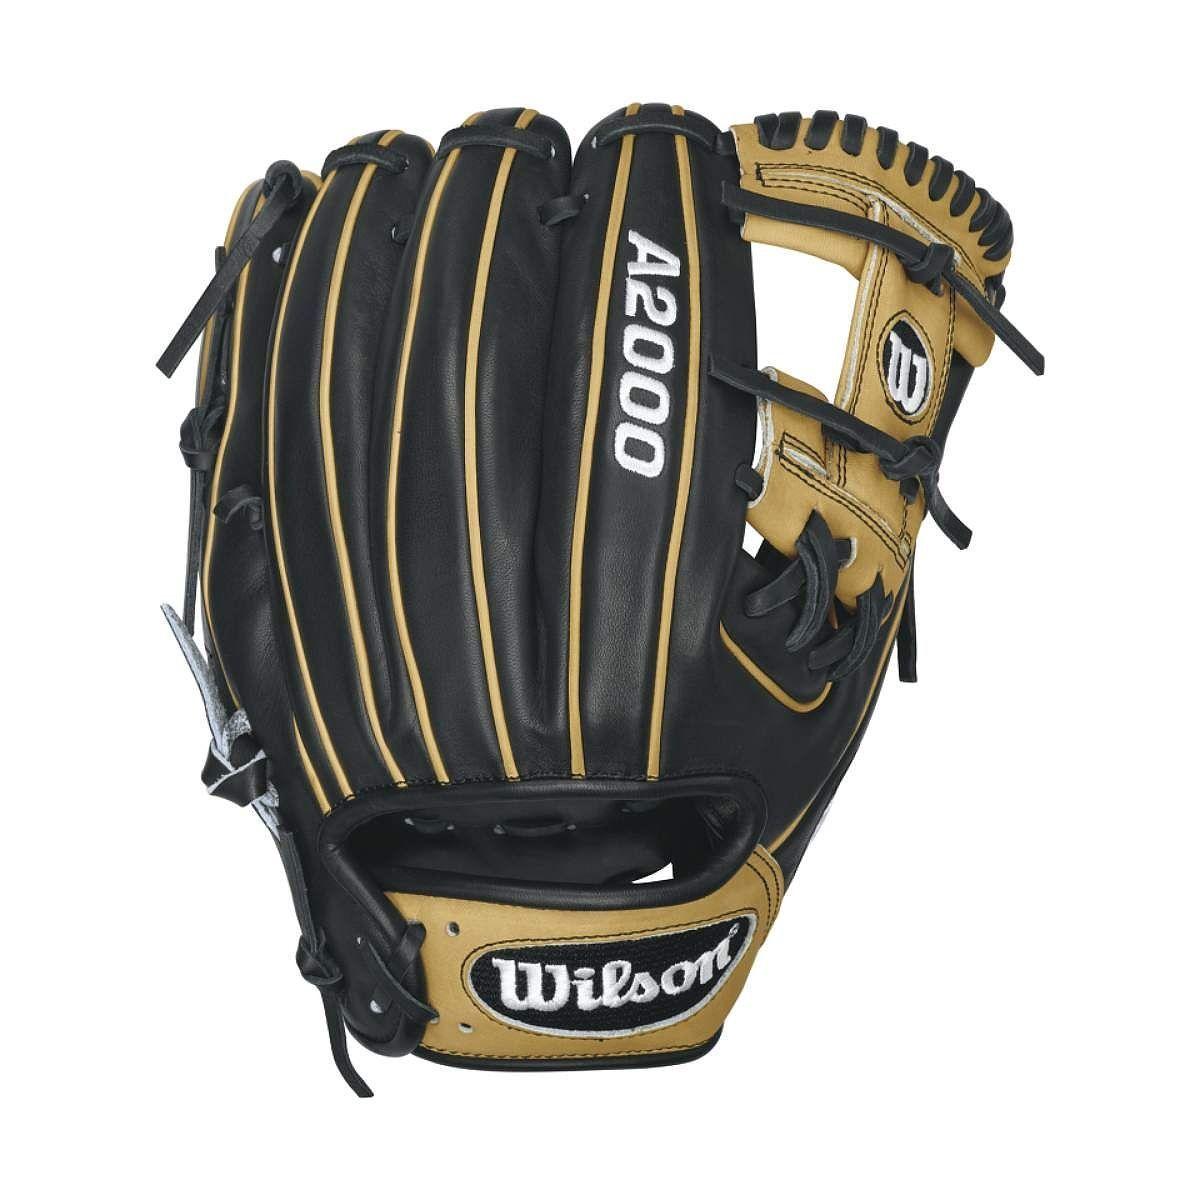 "Wilson A2000 1786 Black/Blonde 11.5"" Baseball Glove"